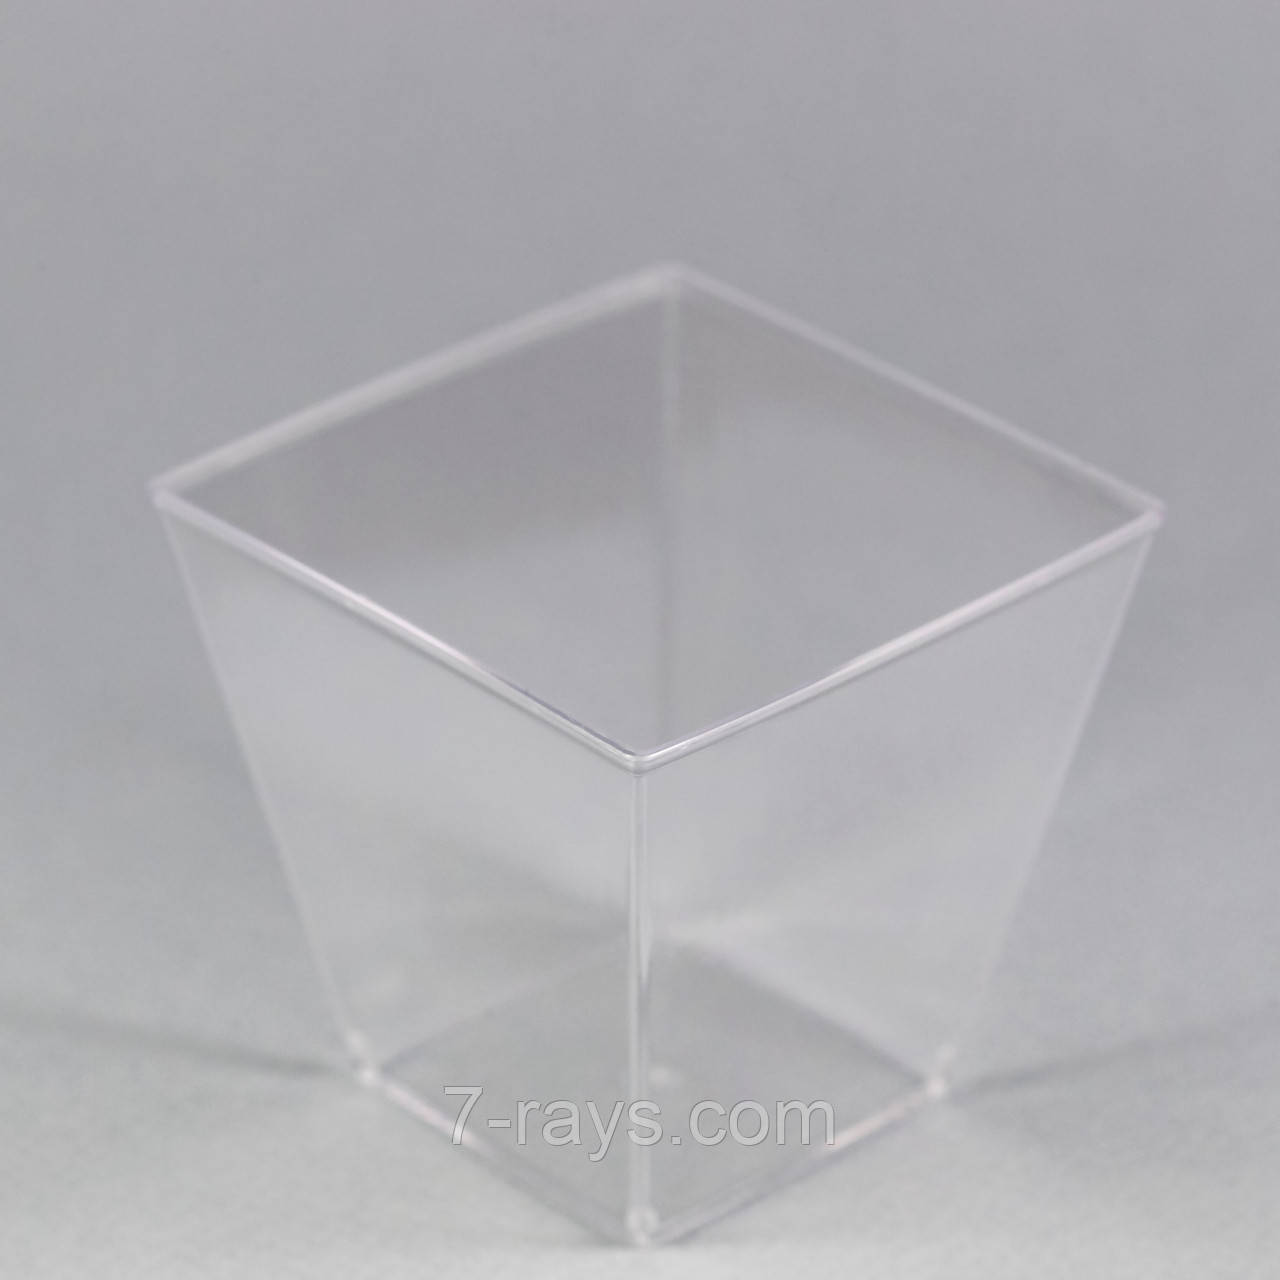 "Пиала фуршетная квадратная 200 мл., 7х7х6,5 см., 50 шт/уп стеклоподобная, прозрачная ""Пирамида"""